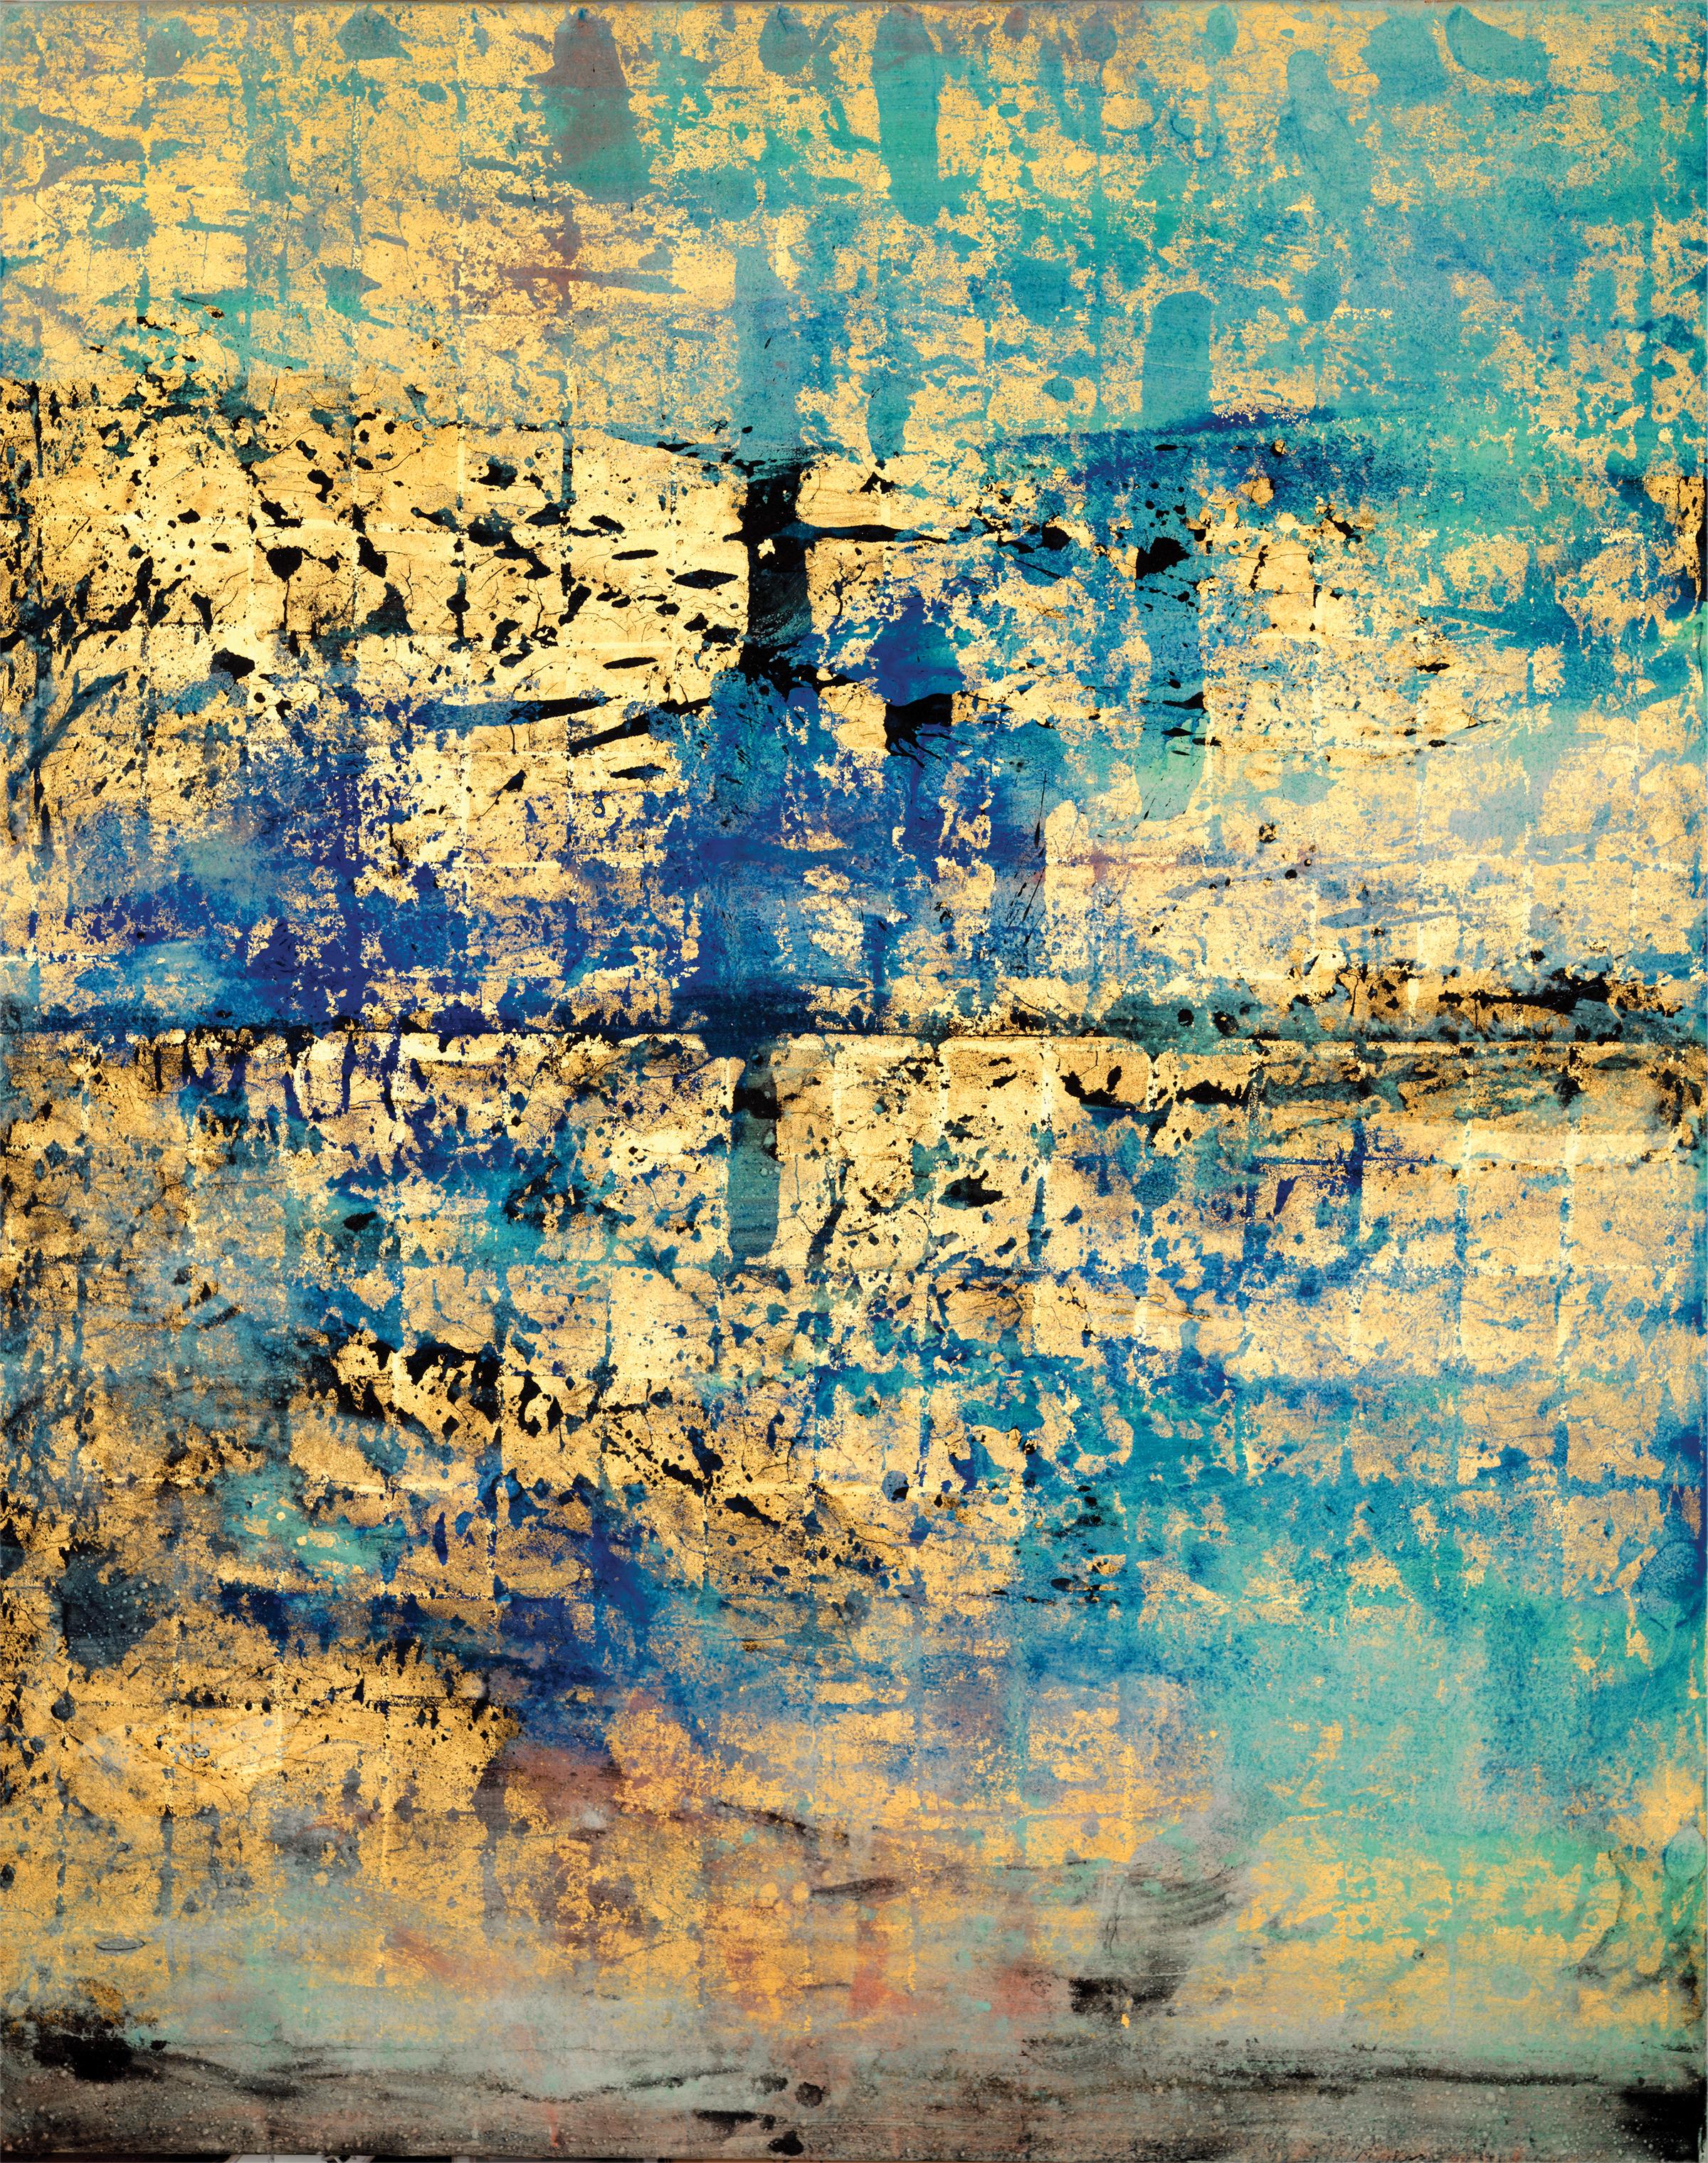 Golden Sea, by Makoto Fujimura. Used with the artist's permission.